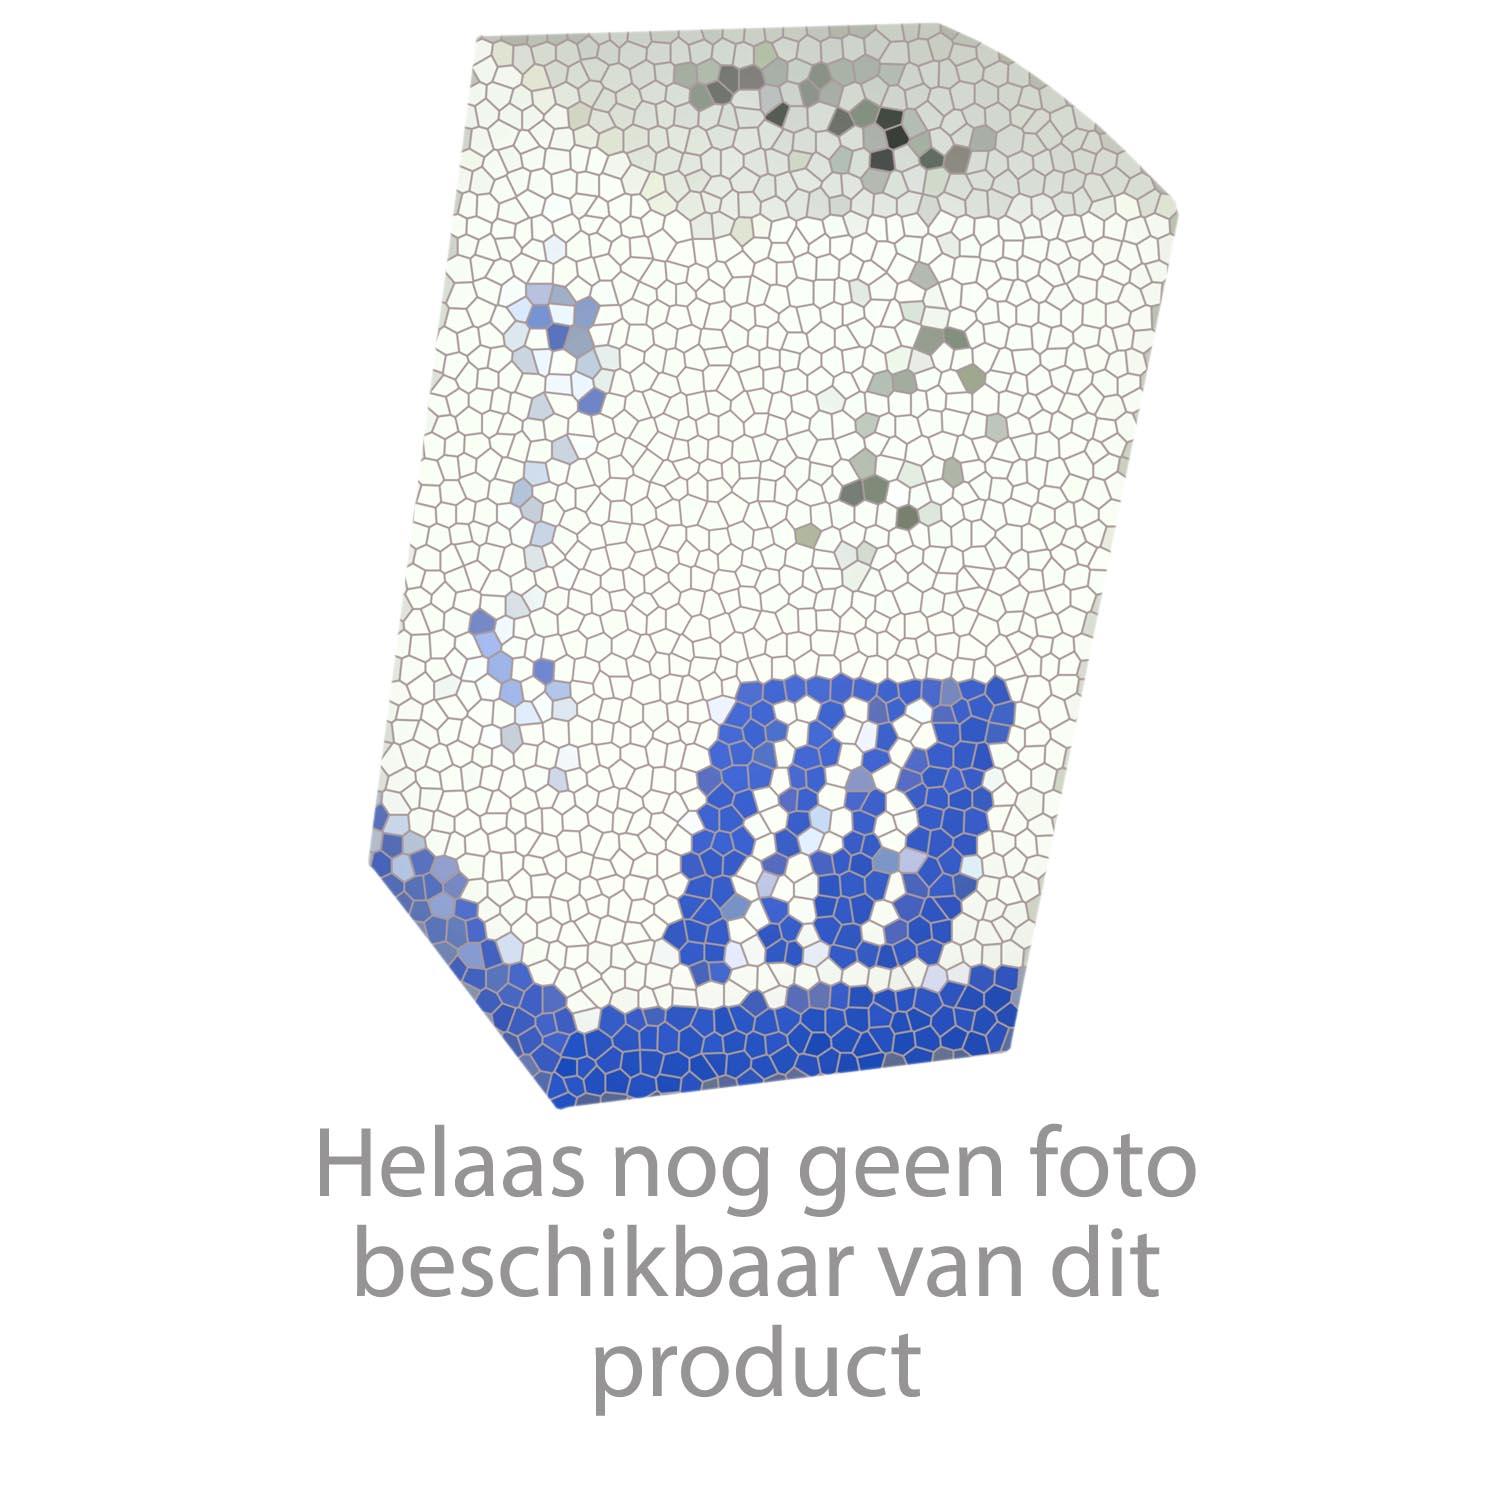 Kemper klemdeel (tussenstukje spindel / sleutel) tbv vorstvrije gevelkraan Frosti 57702 artikelnummer L11005900000100